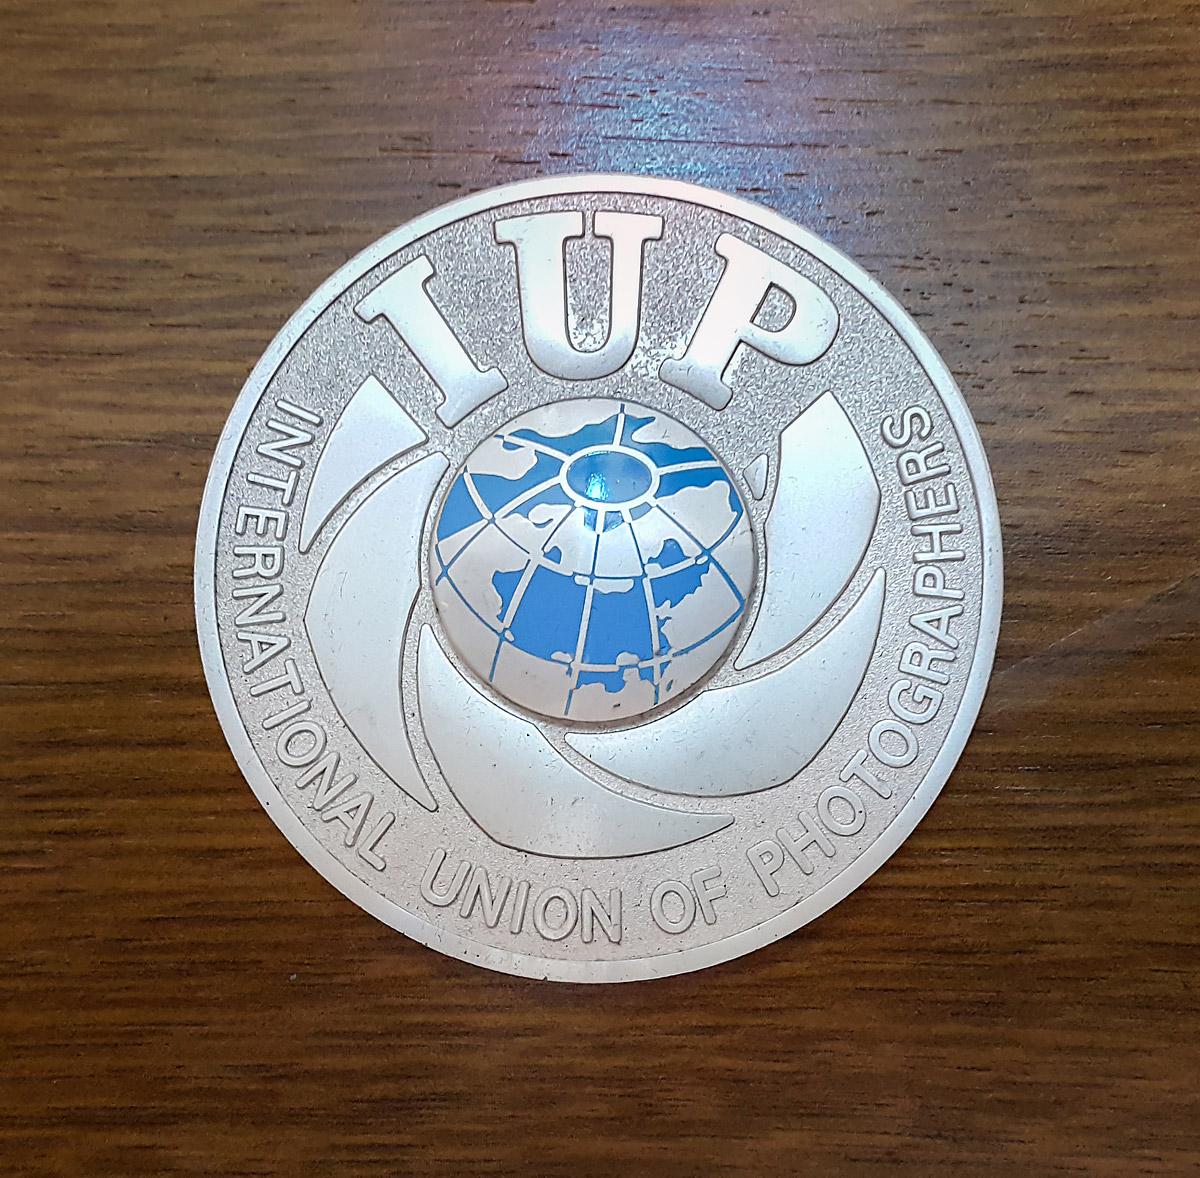 Iup-srebro